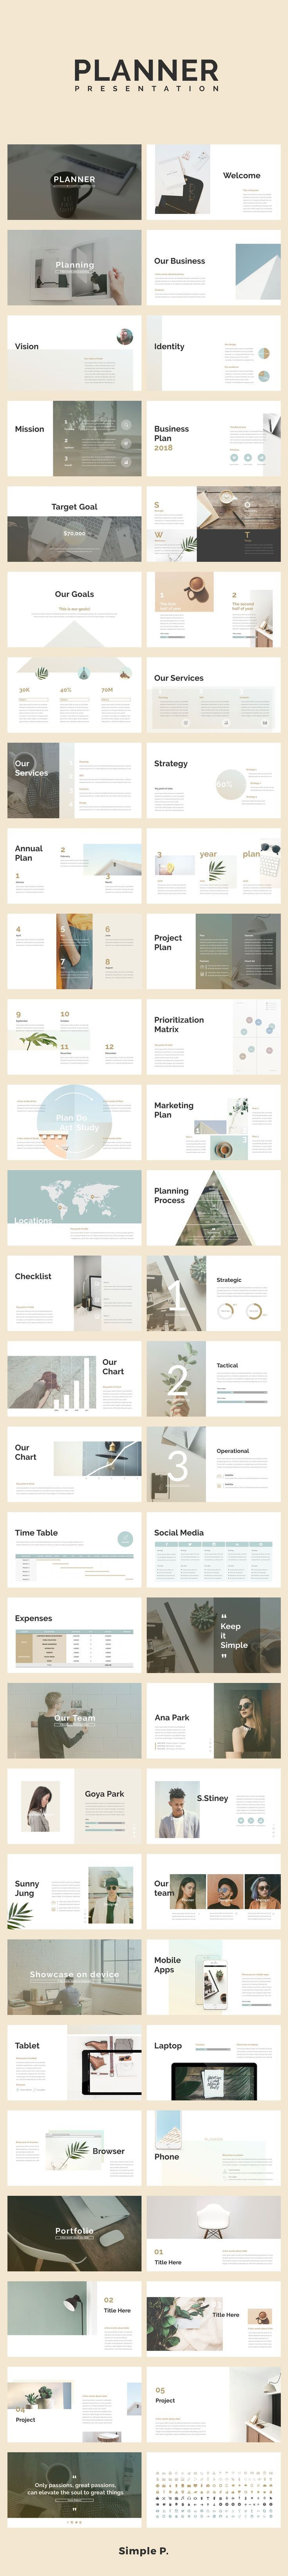 Planner PowerPoint Template. 2018 Business Planning #presentation